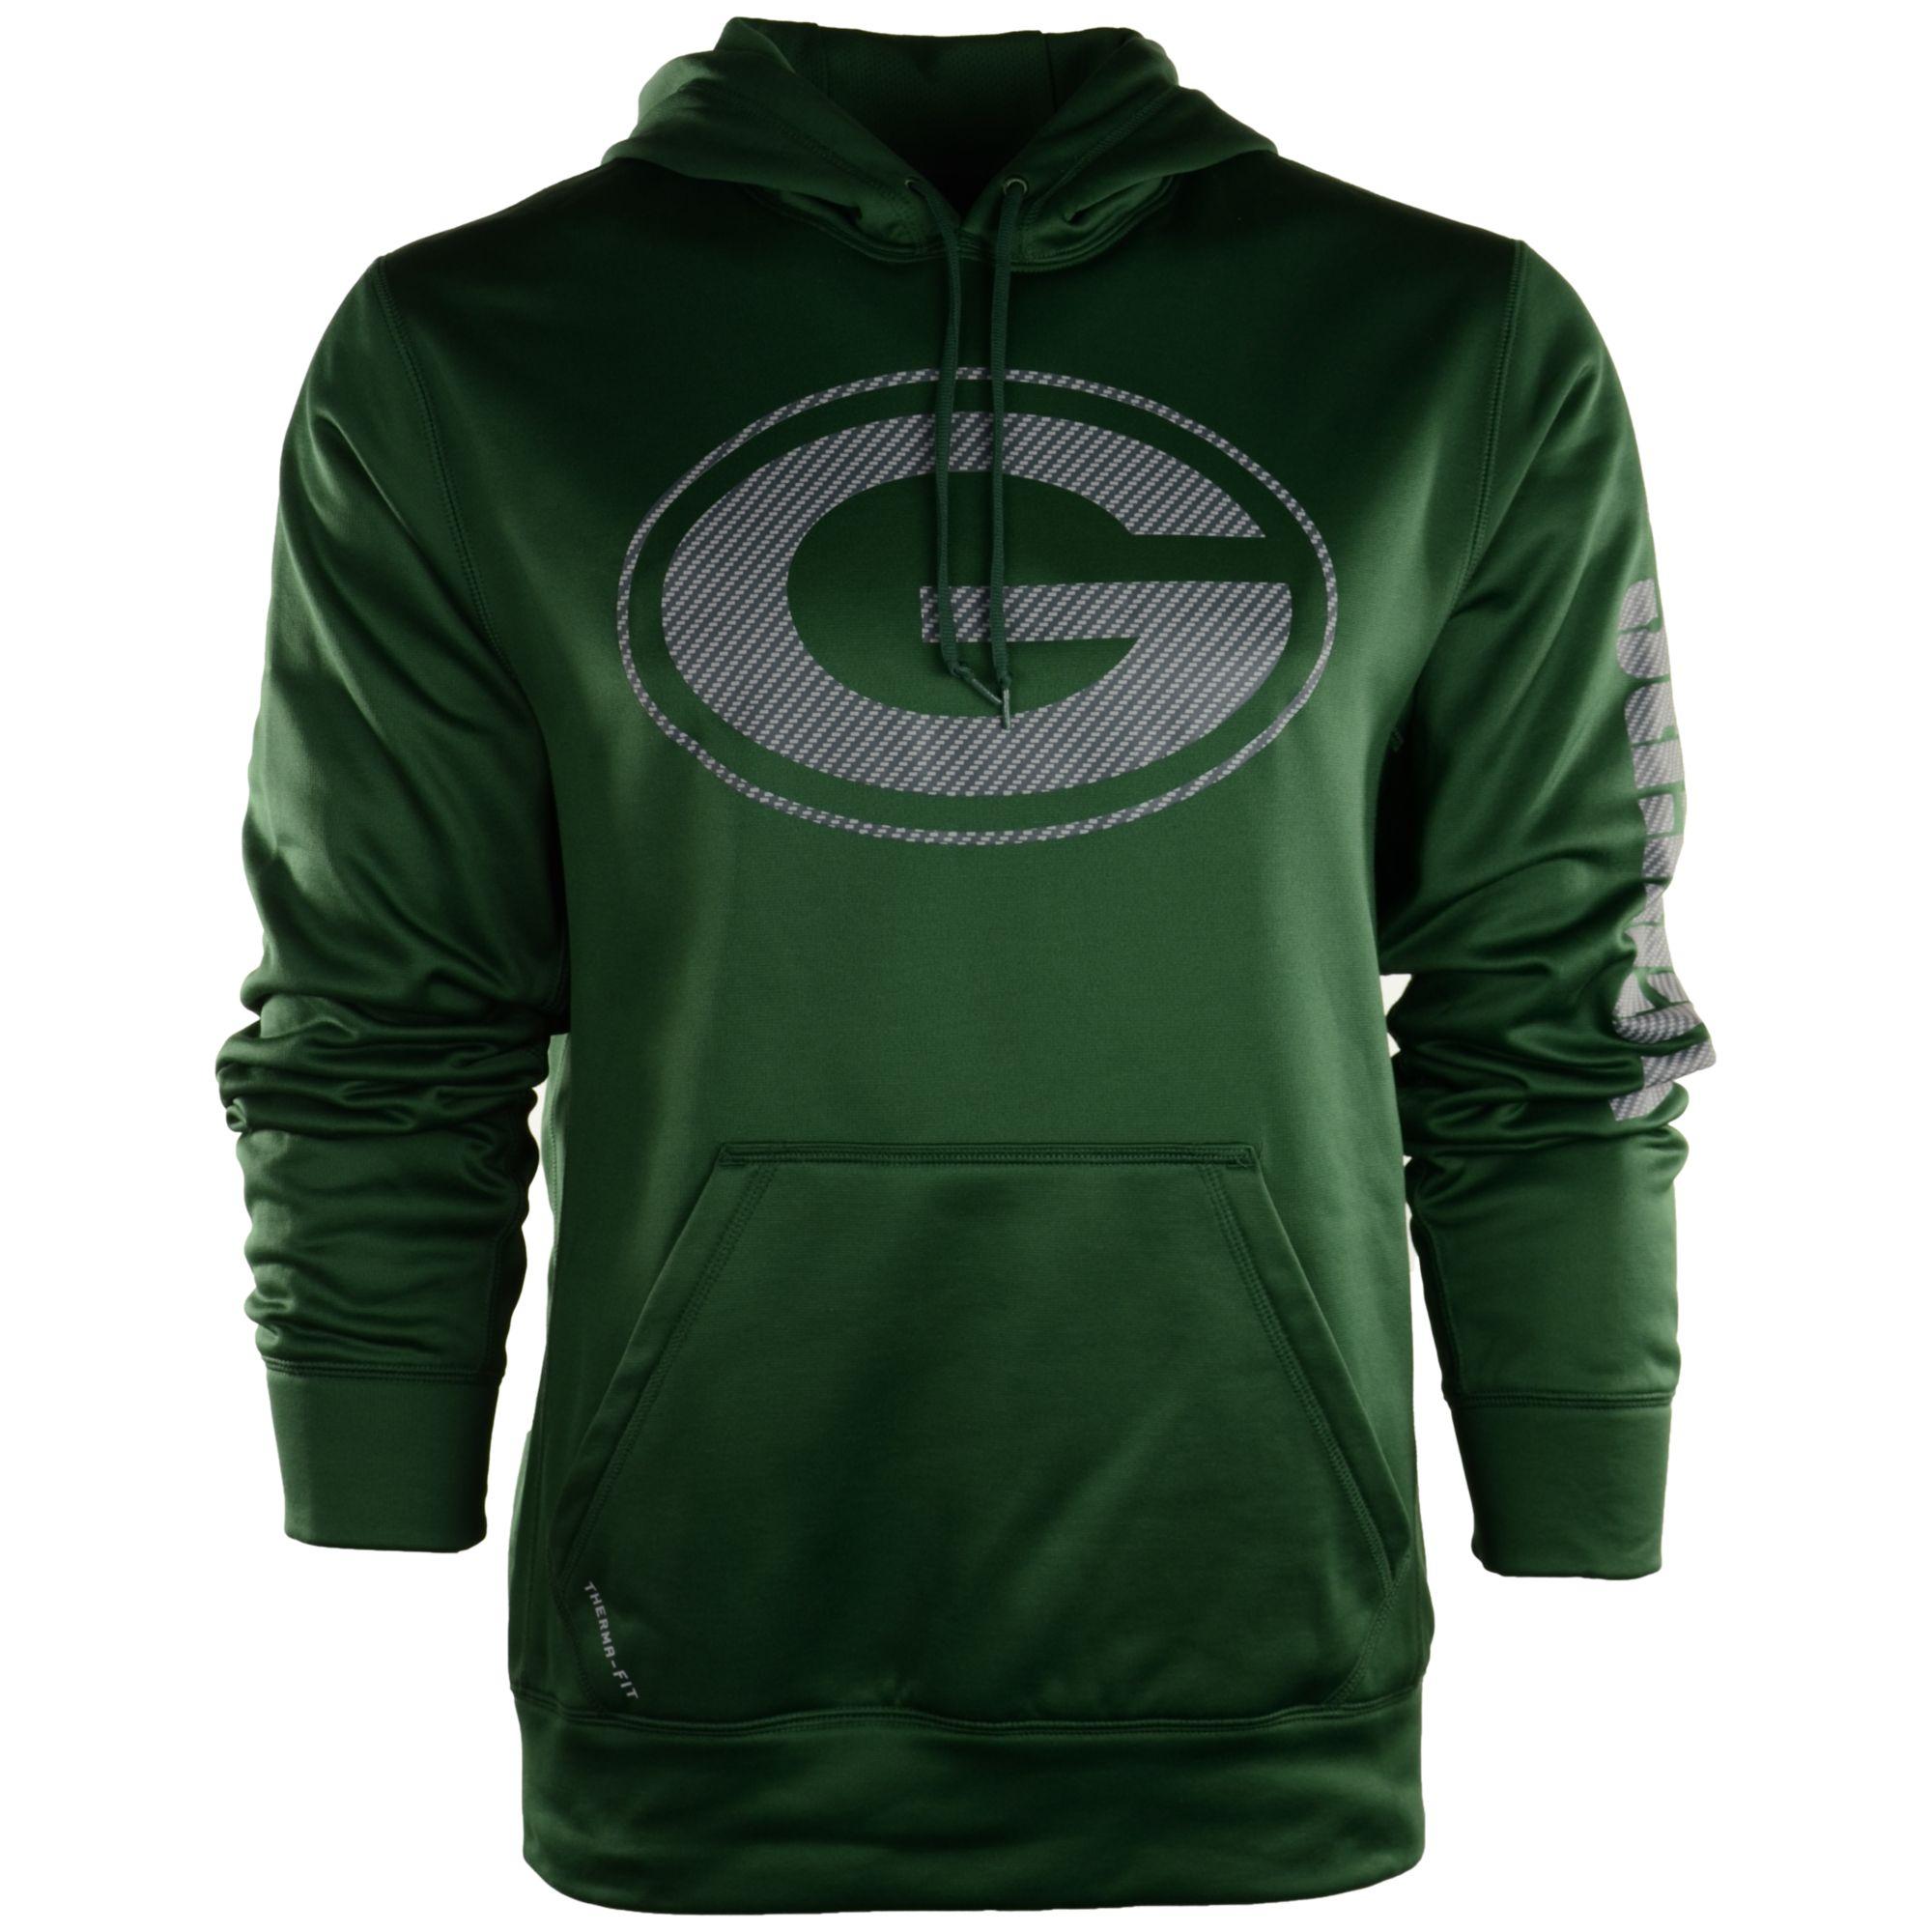 Lyst - Nike Mens Green Bay Packers Carbon Ko Hoodie in Green for Men 72b99d949